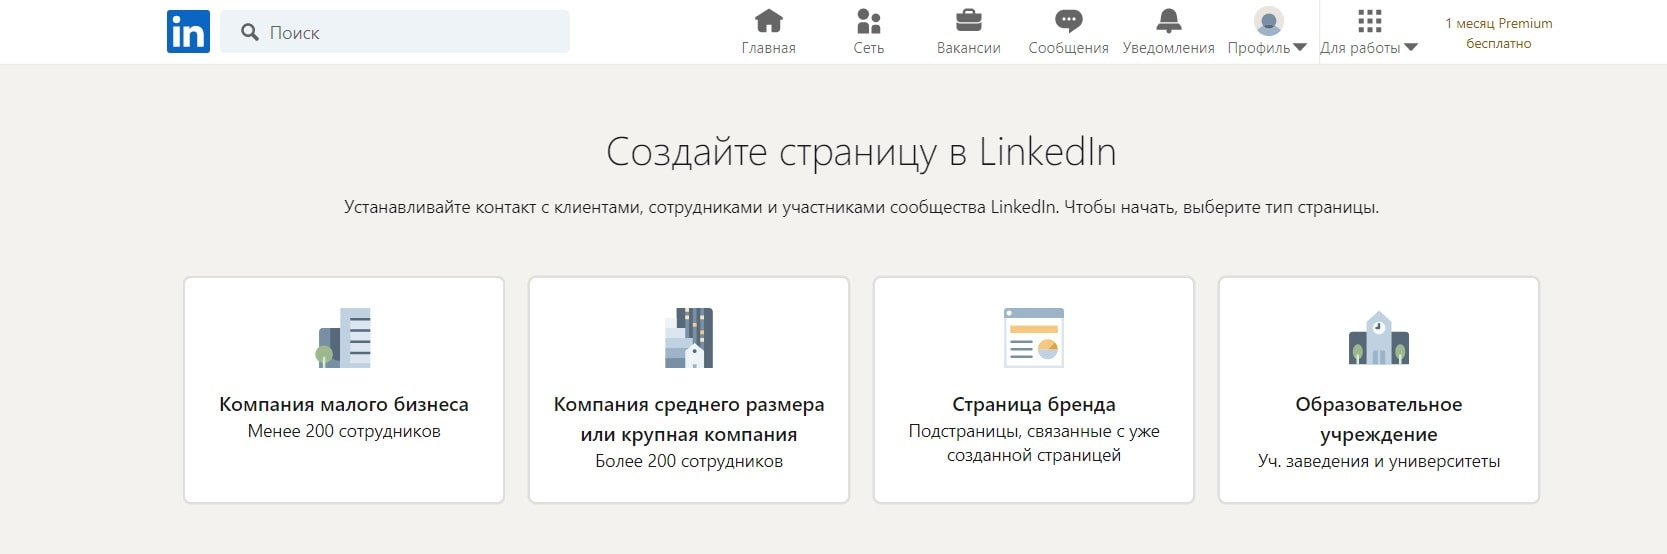 Полное руководство по LinkedIn